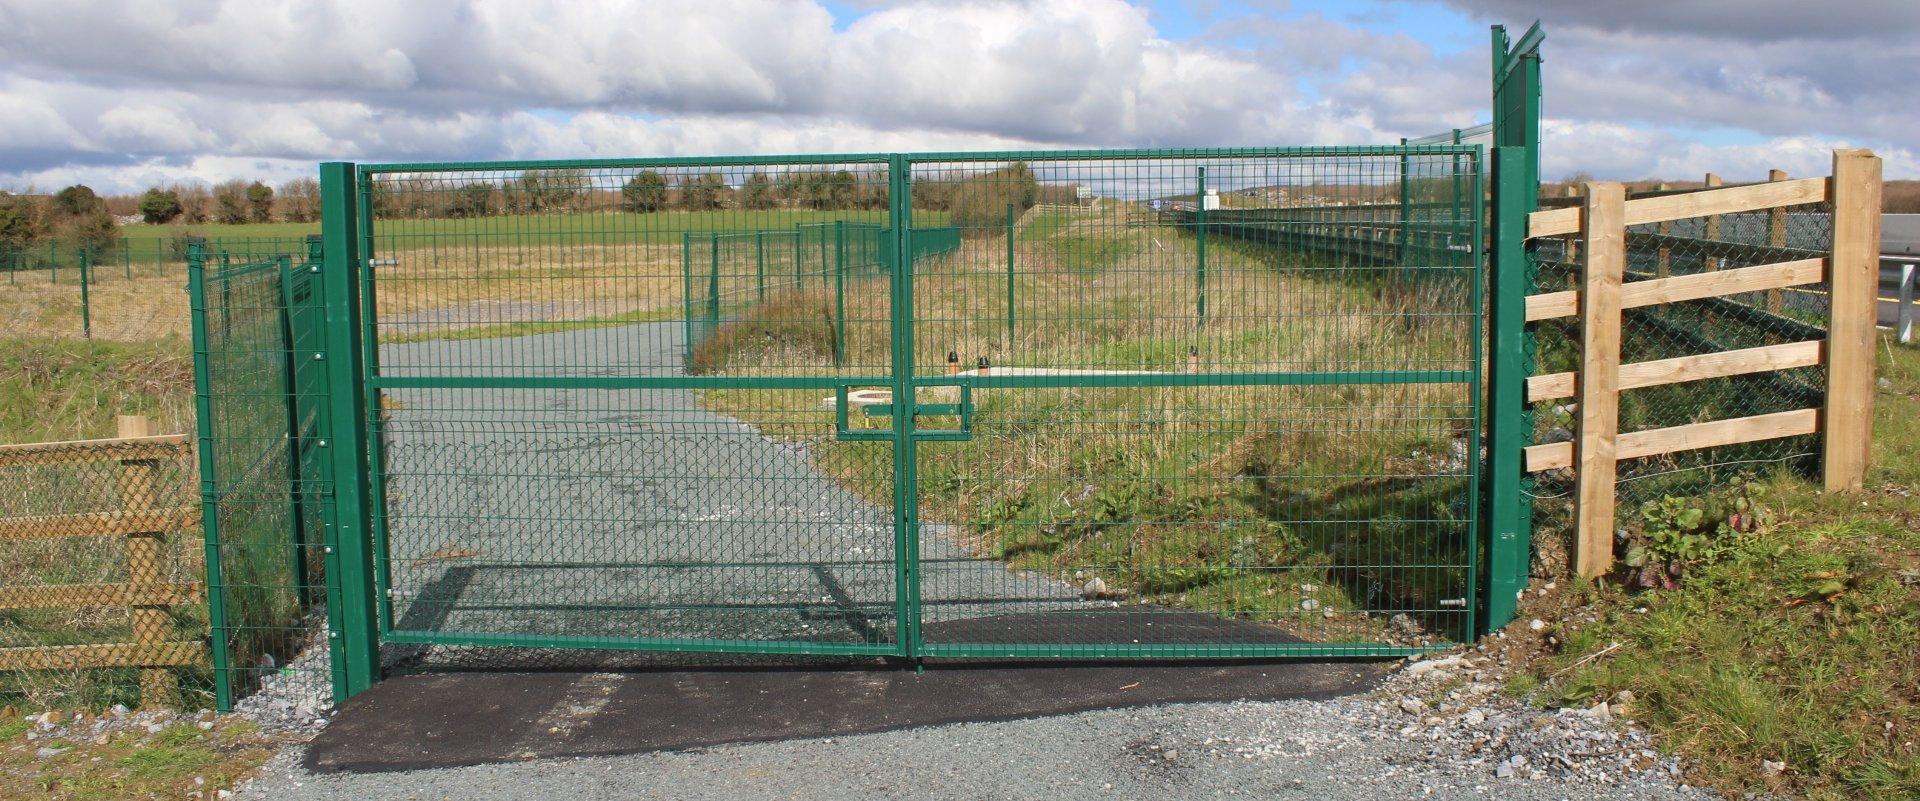 M17, M18 Gort to Tuam, Galway